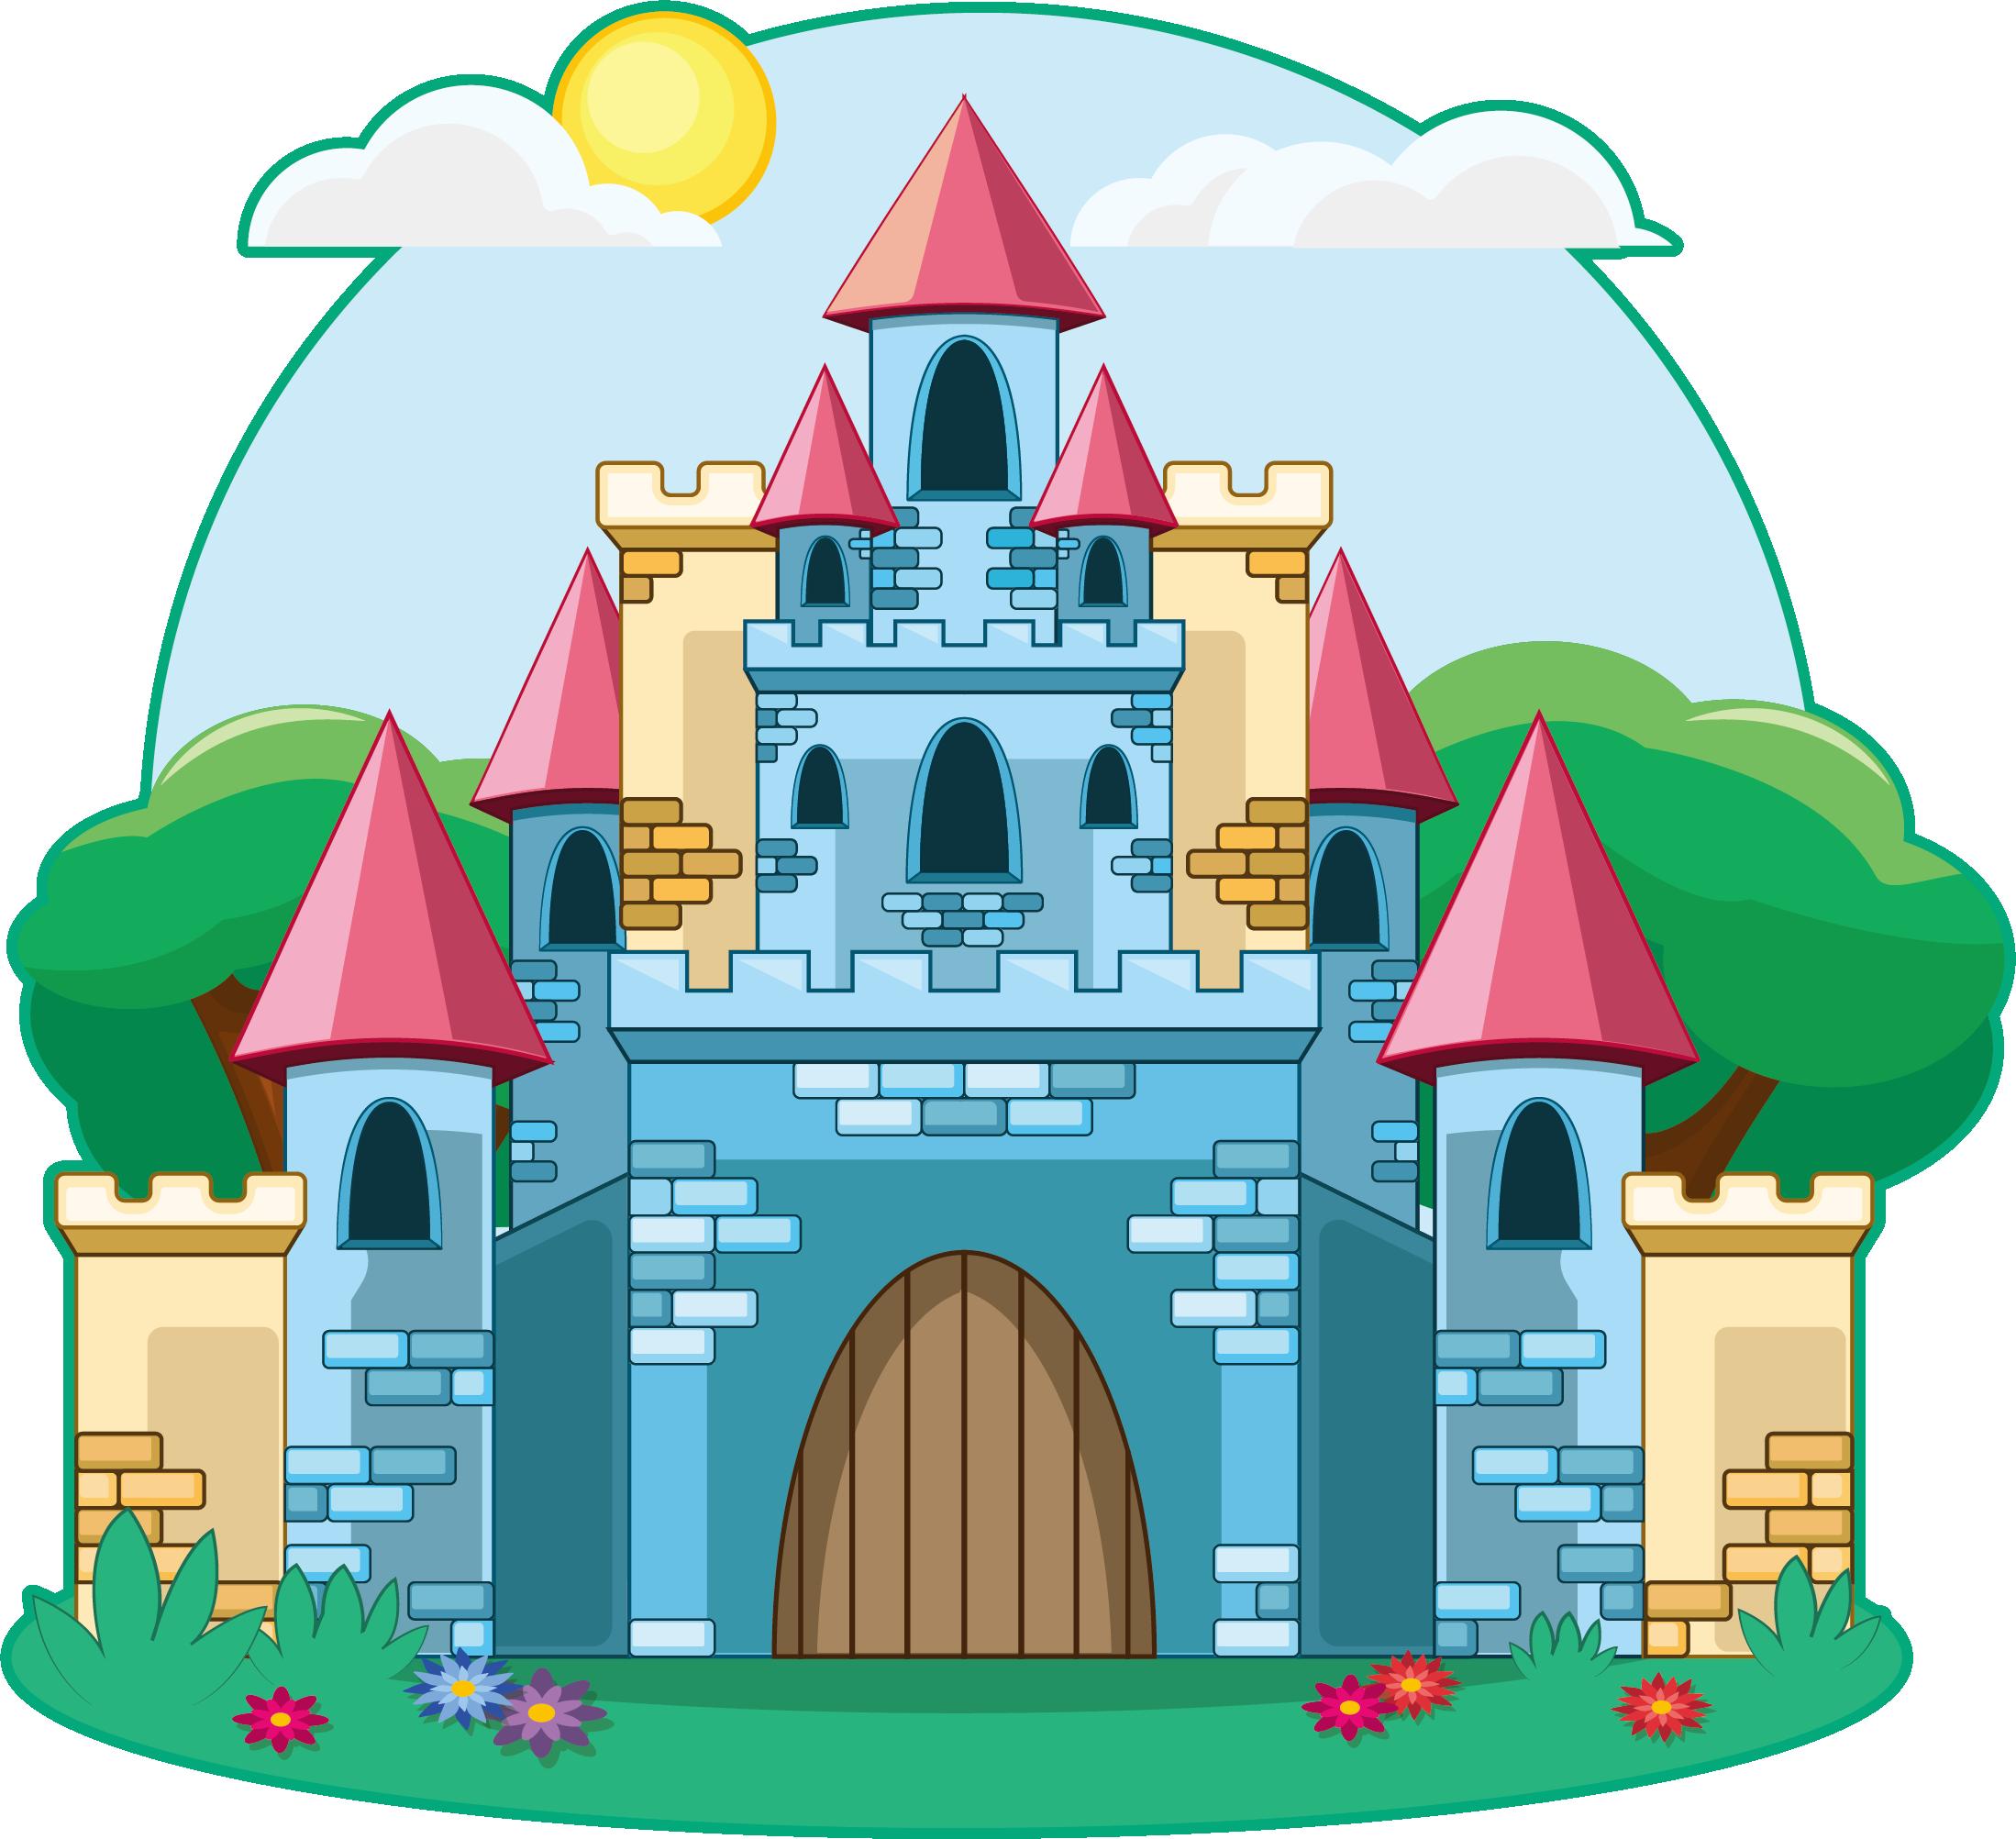 Castle cartoon drawing illustration. Fairytale clipart casle